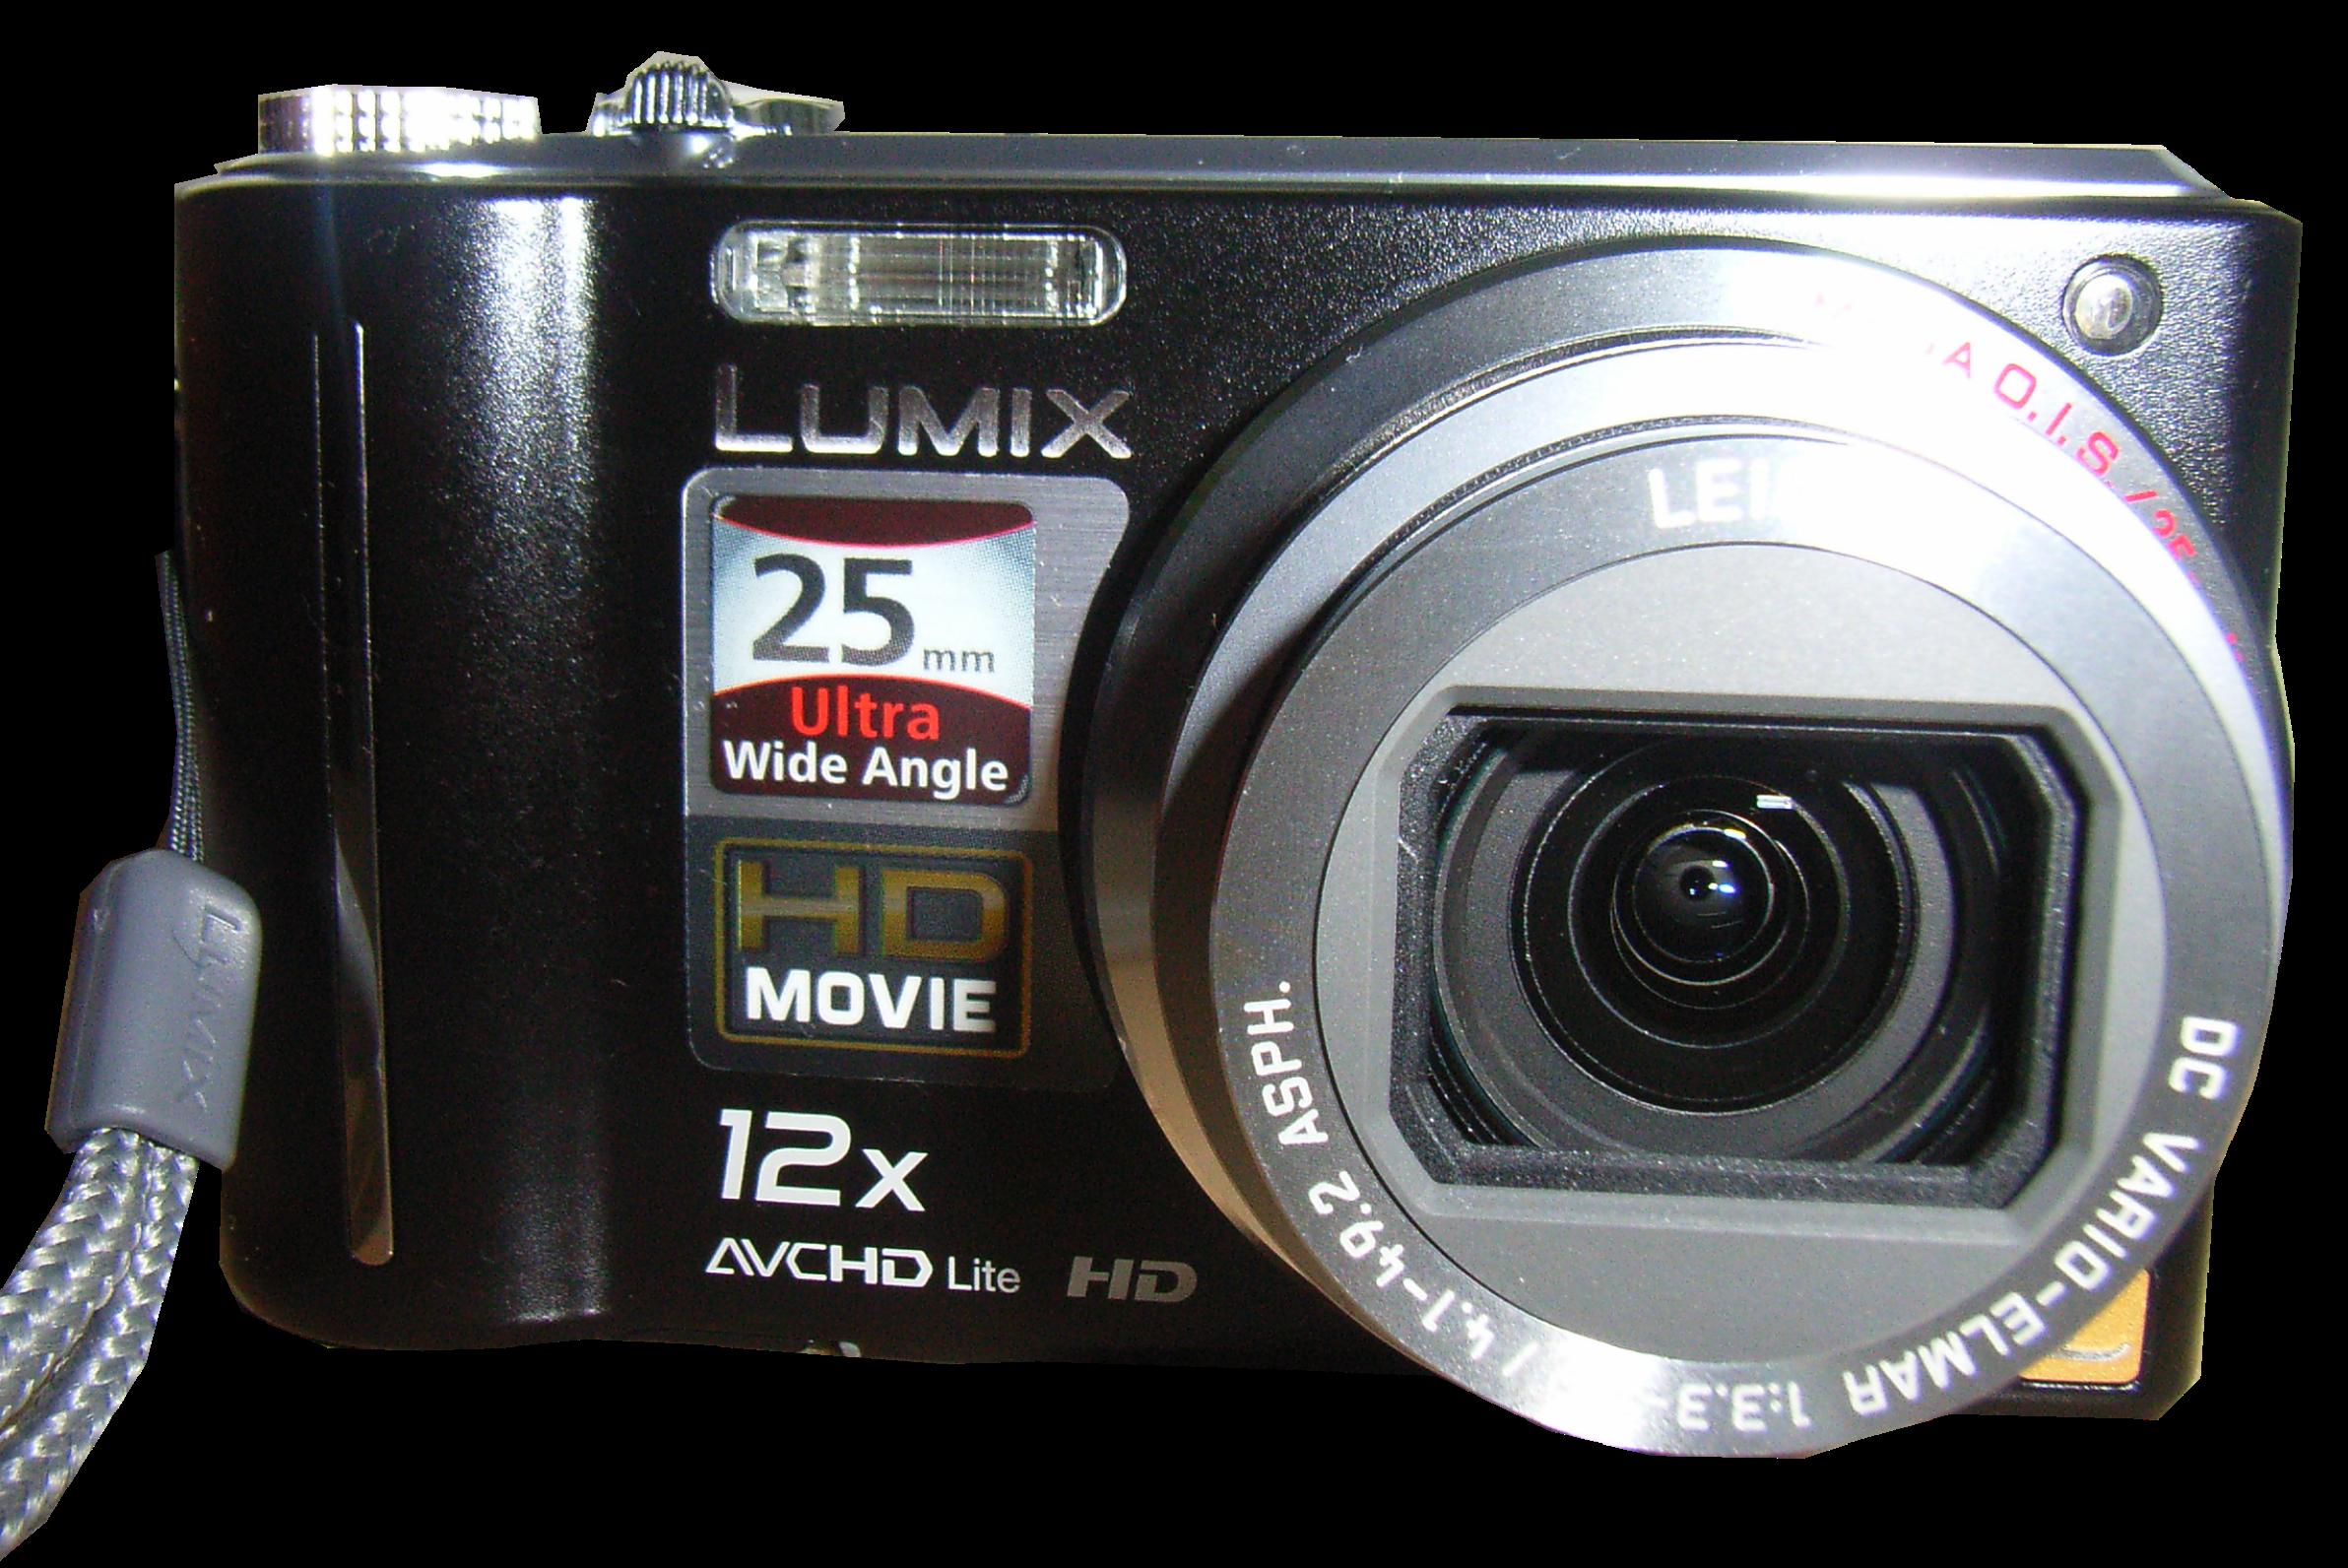 file dmc tz7 png wikimedia commons rh commons wikimedia org Panasonic DMC ZS8 Manual lumix dmc-tz7 user manual